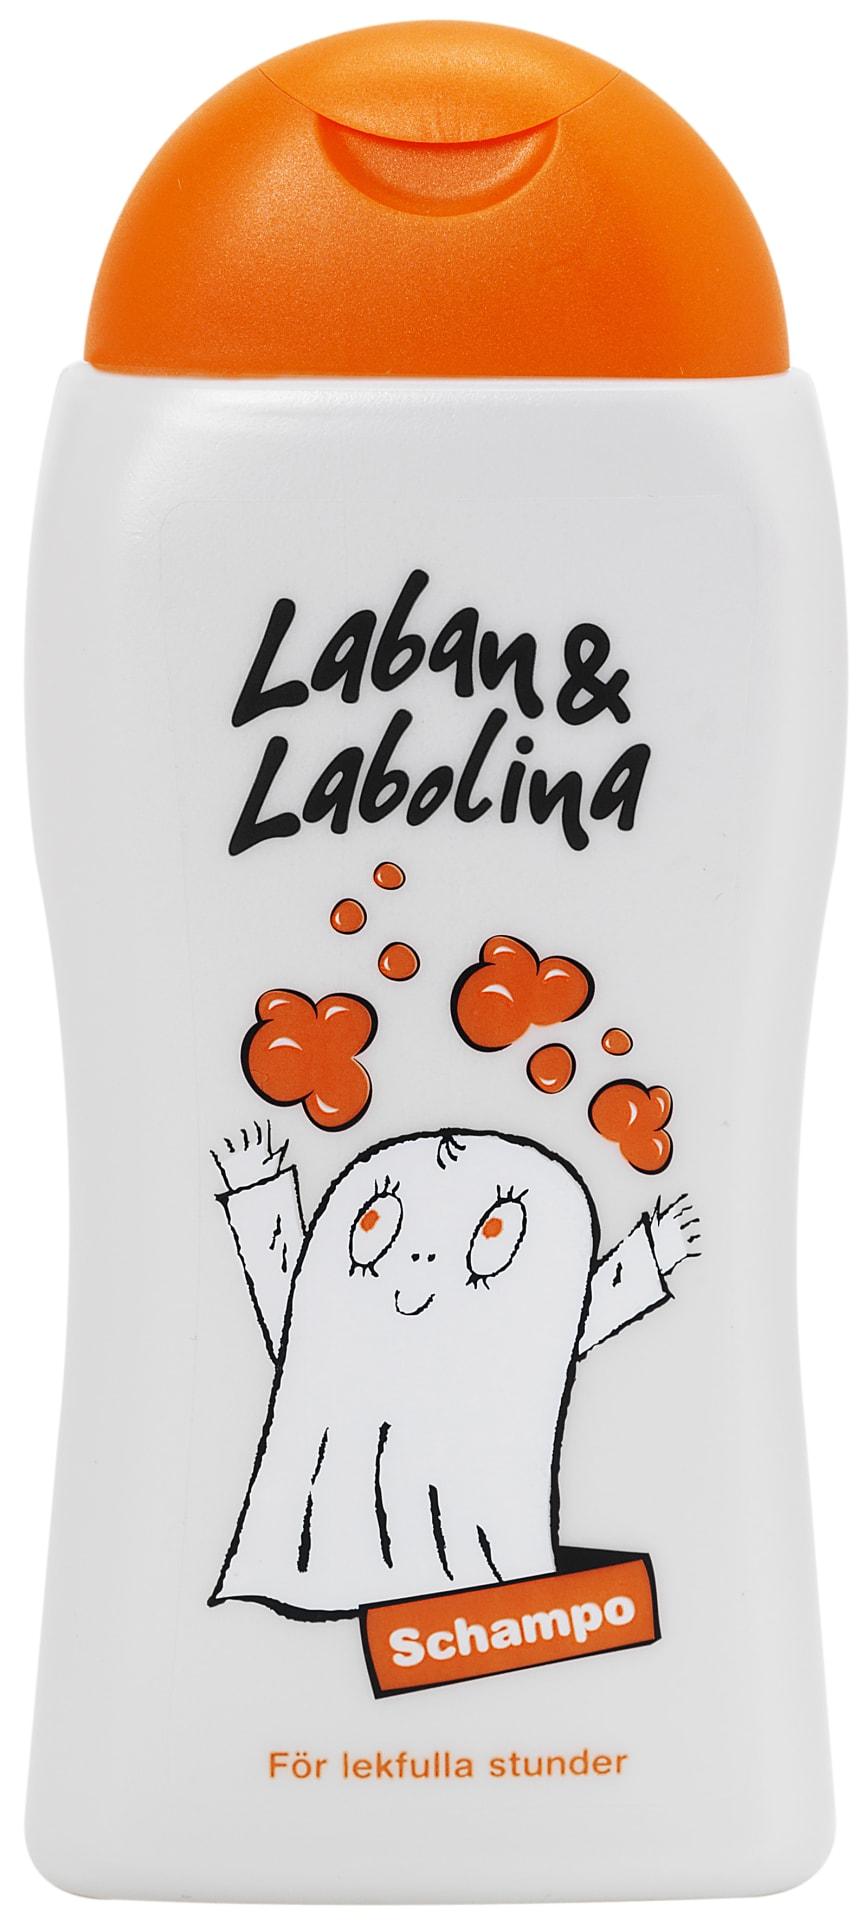 Schampo Laban & Labolina, 250 ml